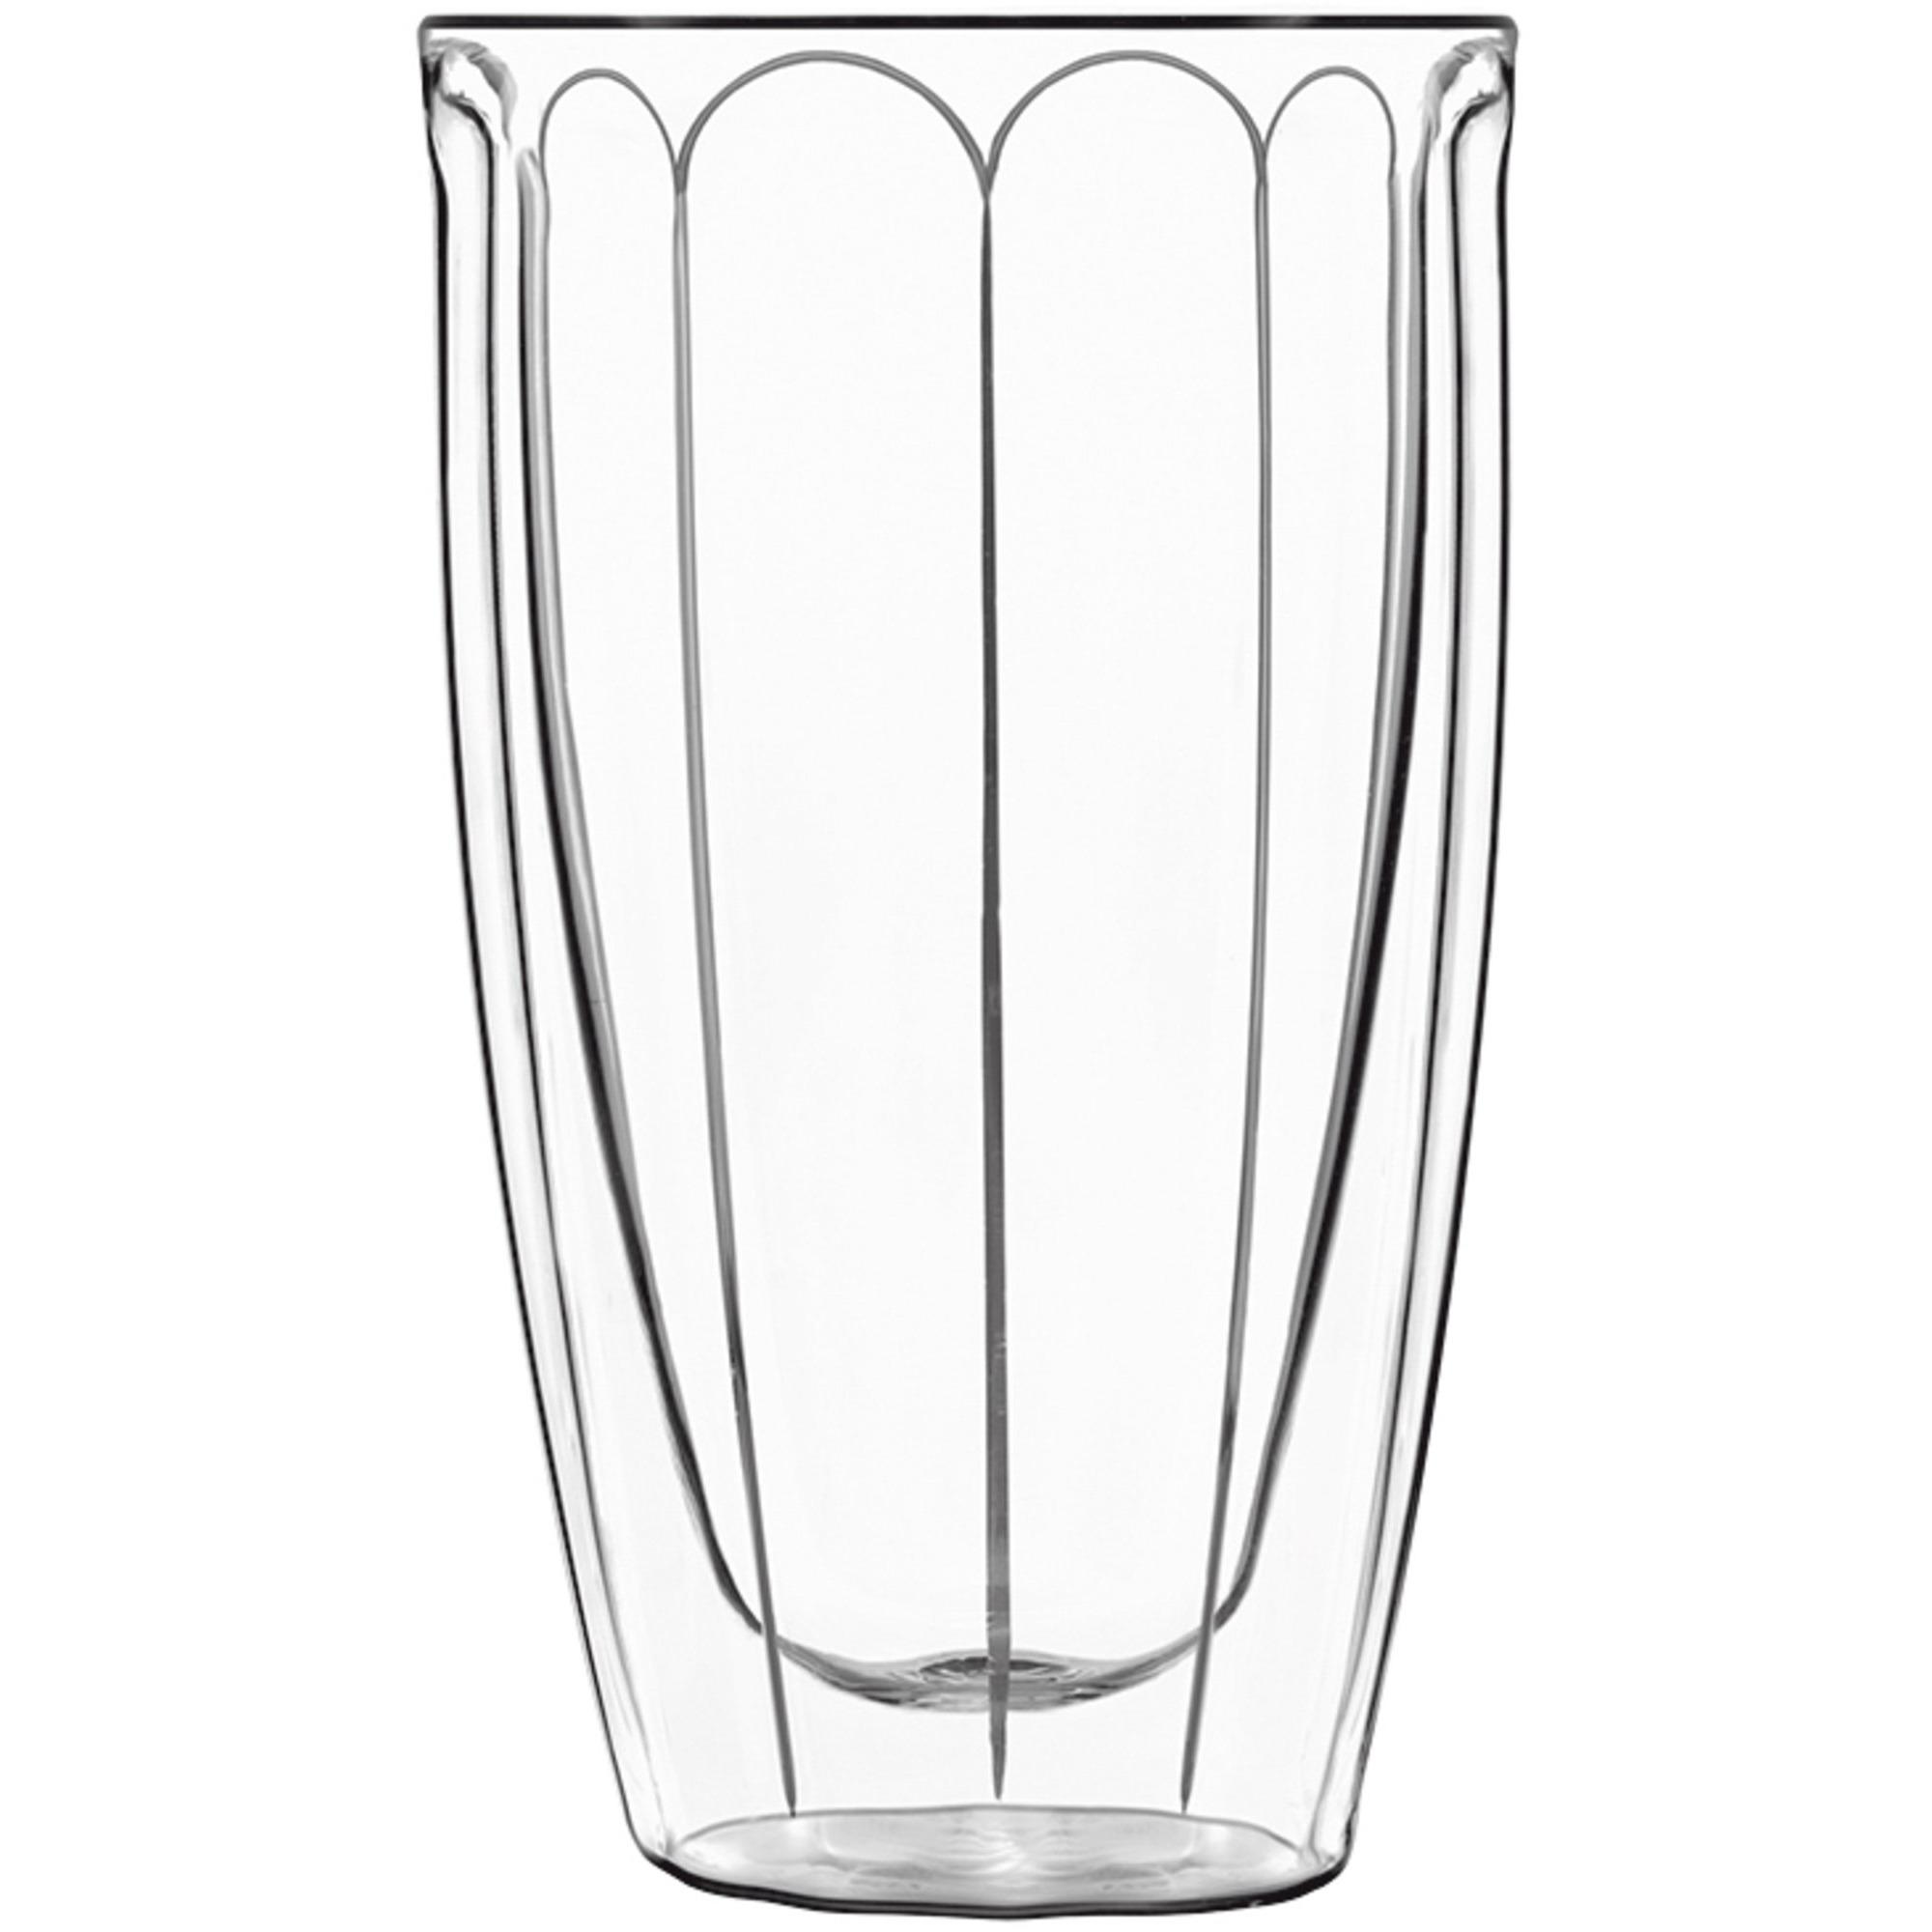 Luigi Bormioli 2 st. Thermic Happy Days long-drinks / kaffeglas